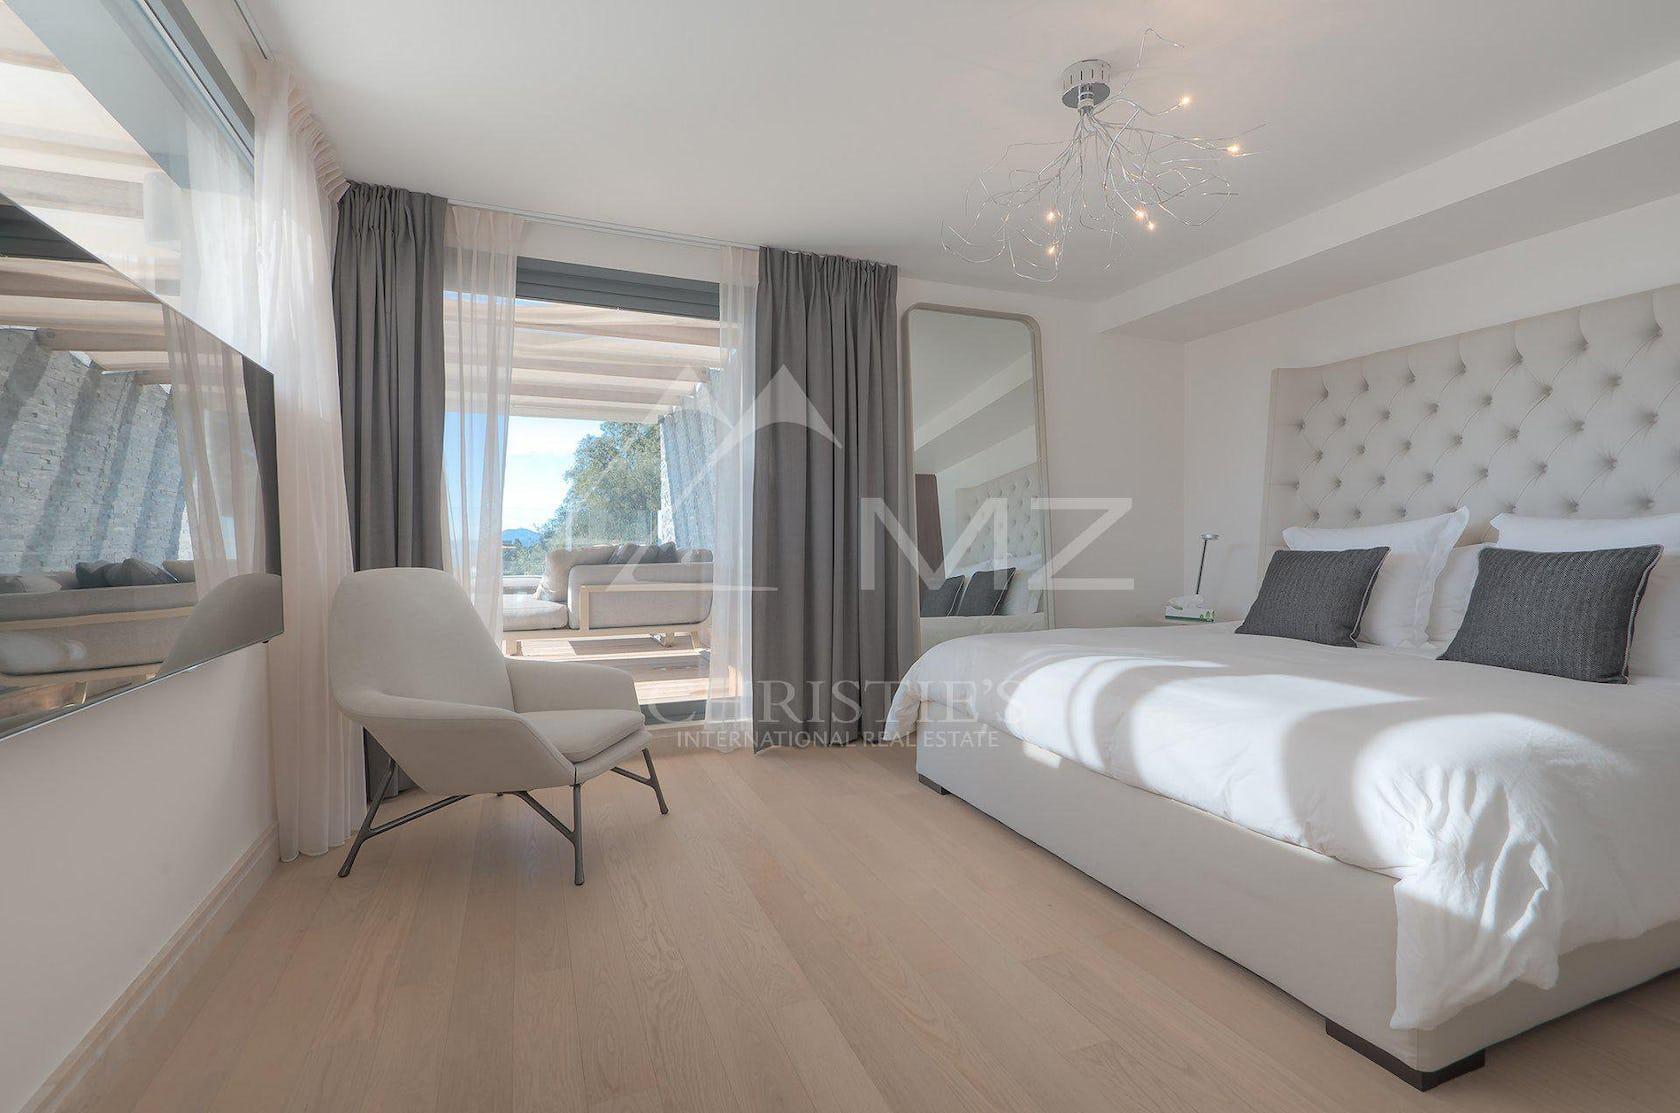 flooring floor wood furniture interior design indoors hardwood room bedroom living room